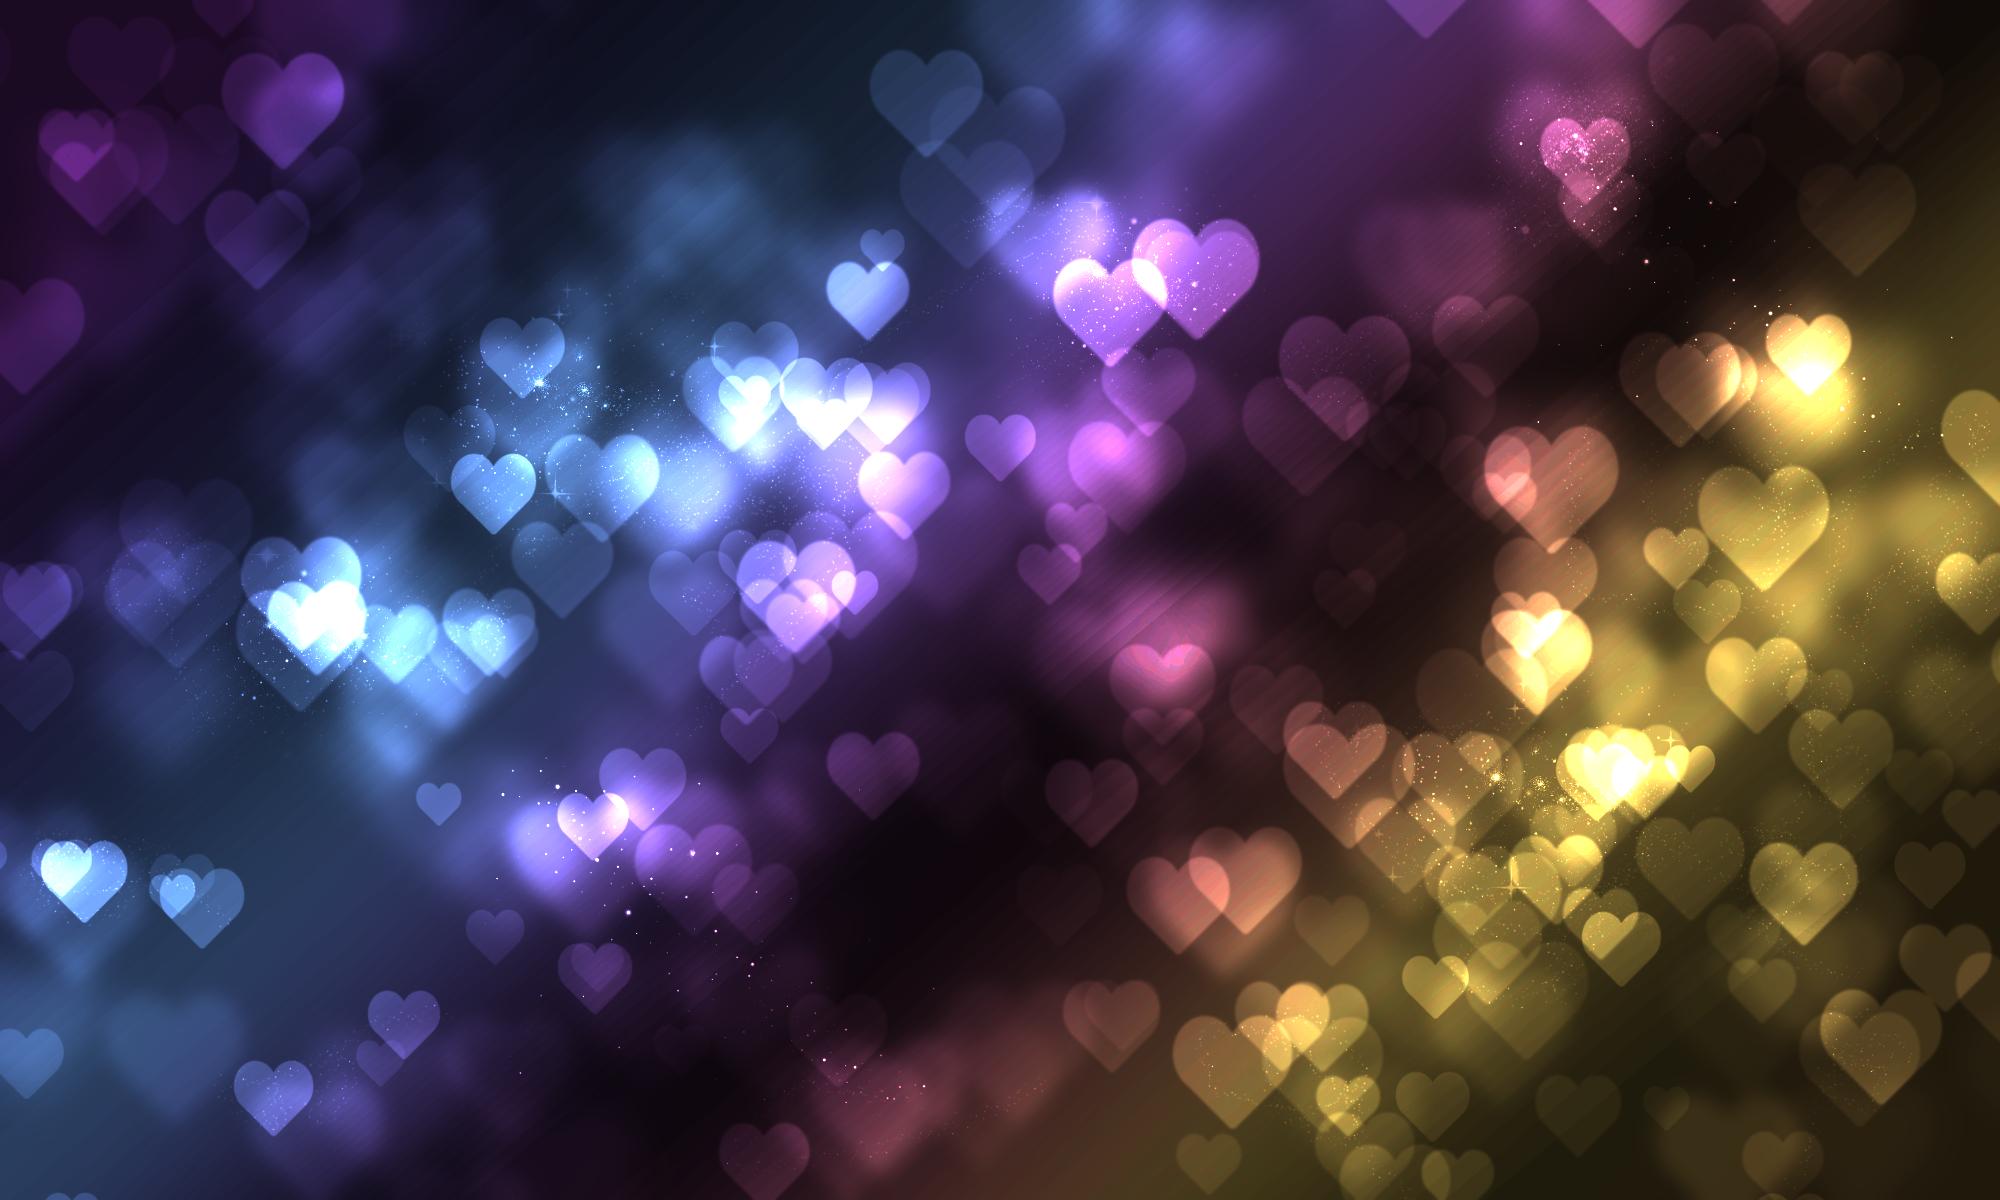 Traeh (=heart) bokeh by diamondlightart